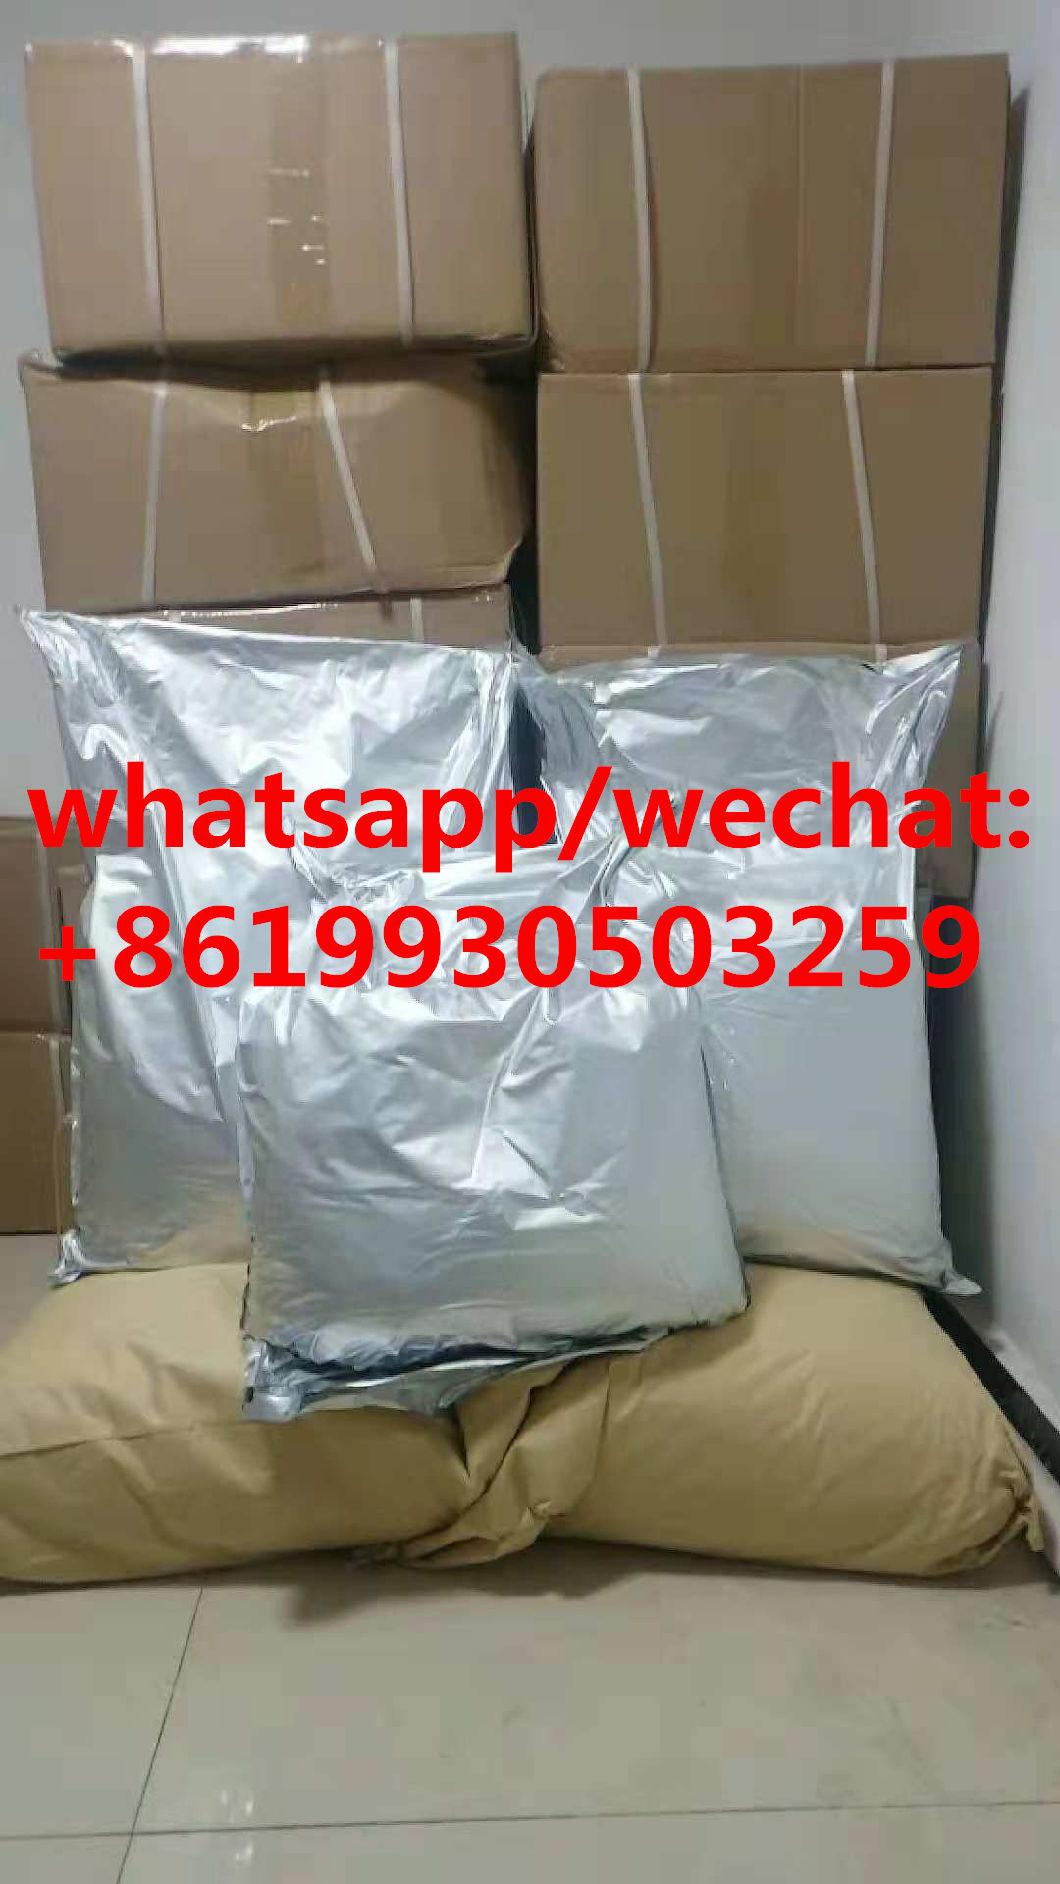 16648-44-5 Bmk / Bmk Powder / Bmk Glycidate Powder Cas 16648-44-5 +